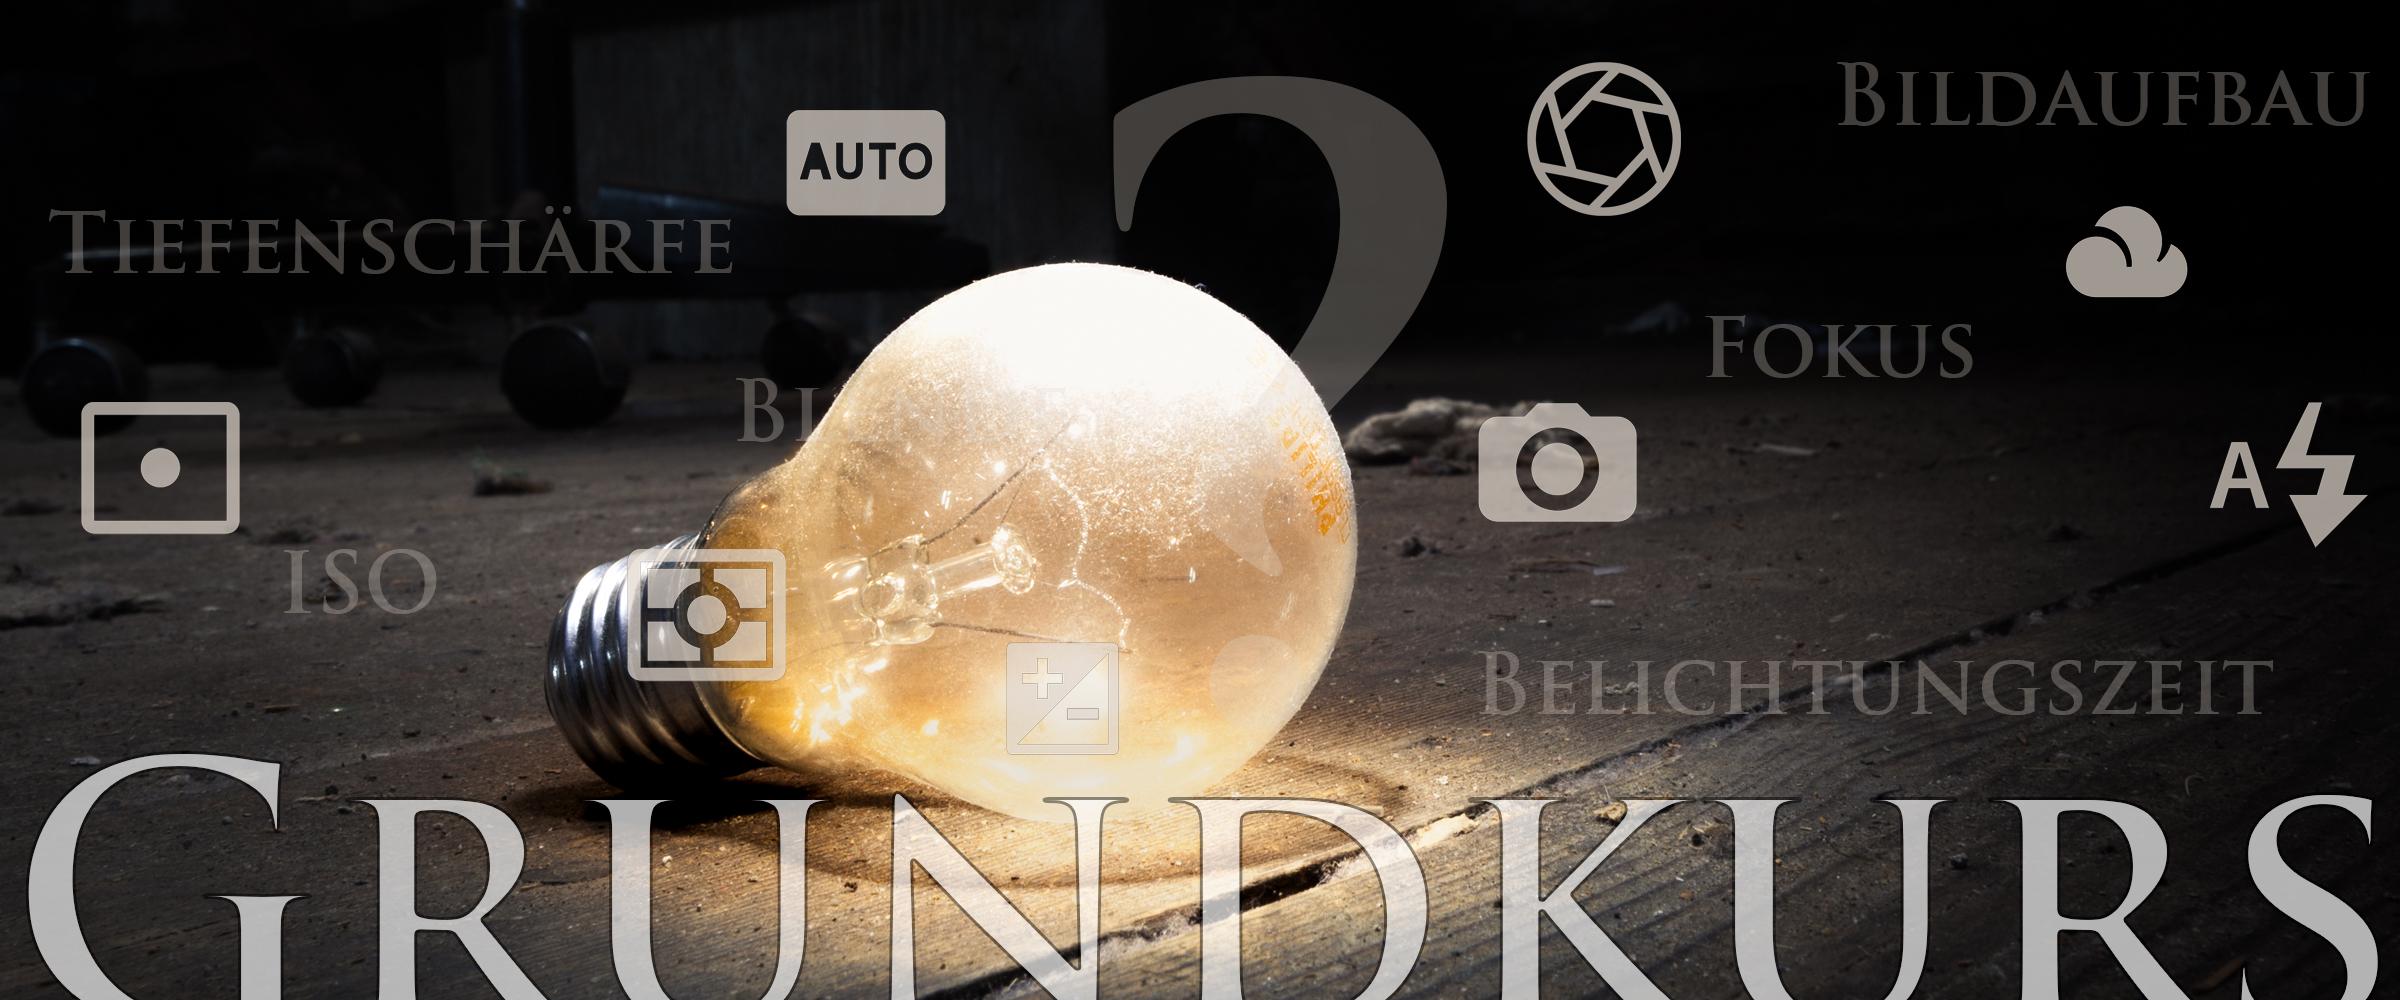 Tageskurs, Grundkurs, Anfänger, Fotografie, Fotoschule, Fotokurs, Bremen